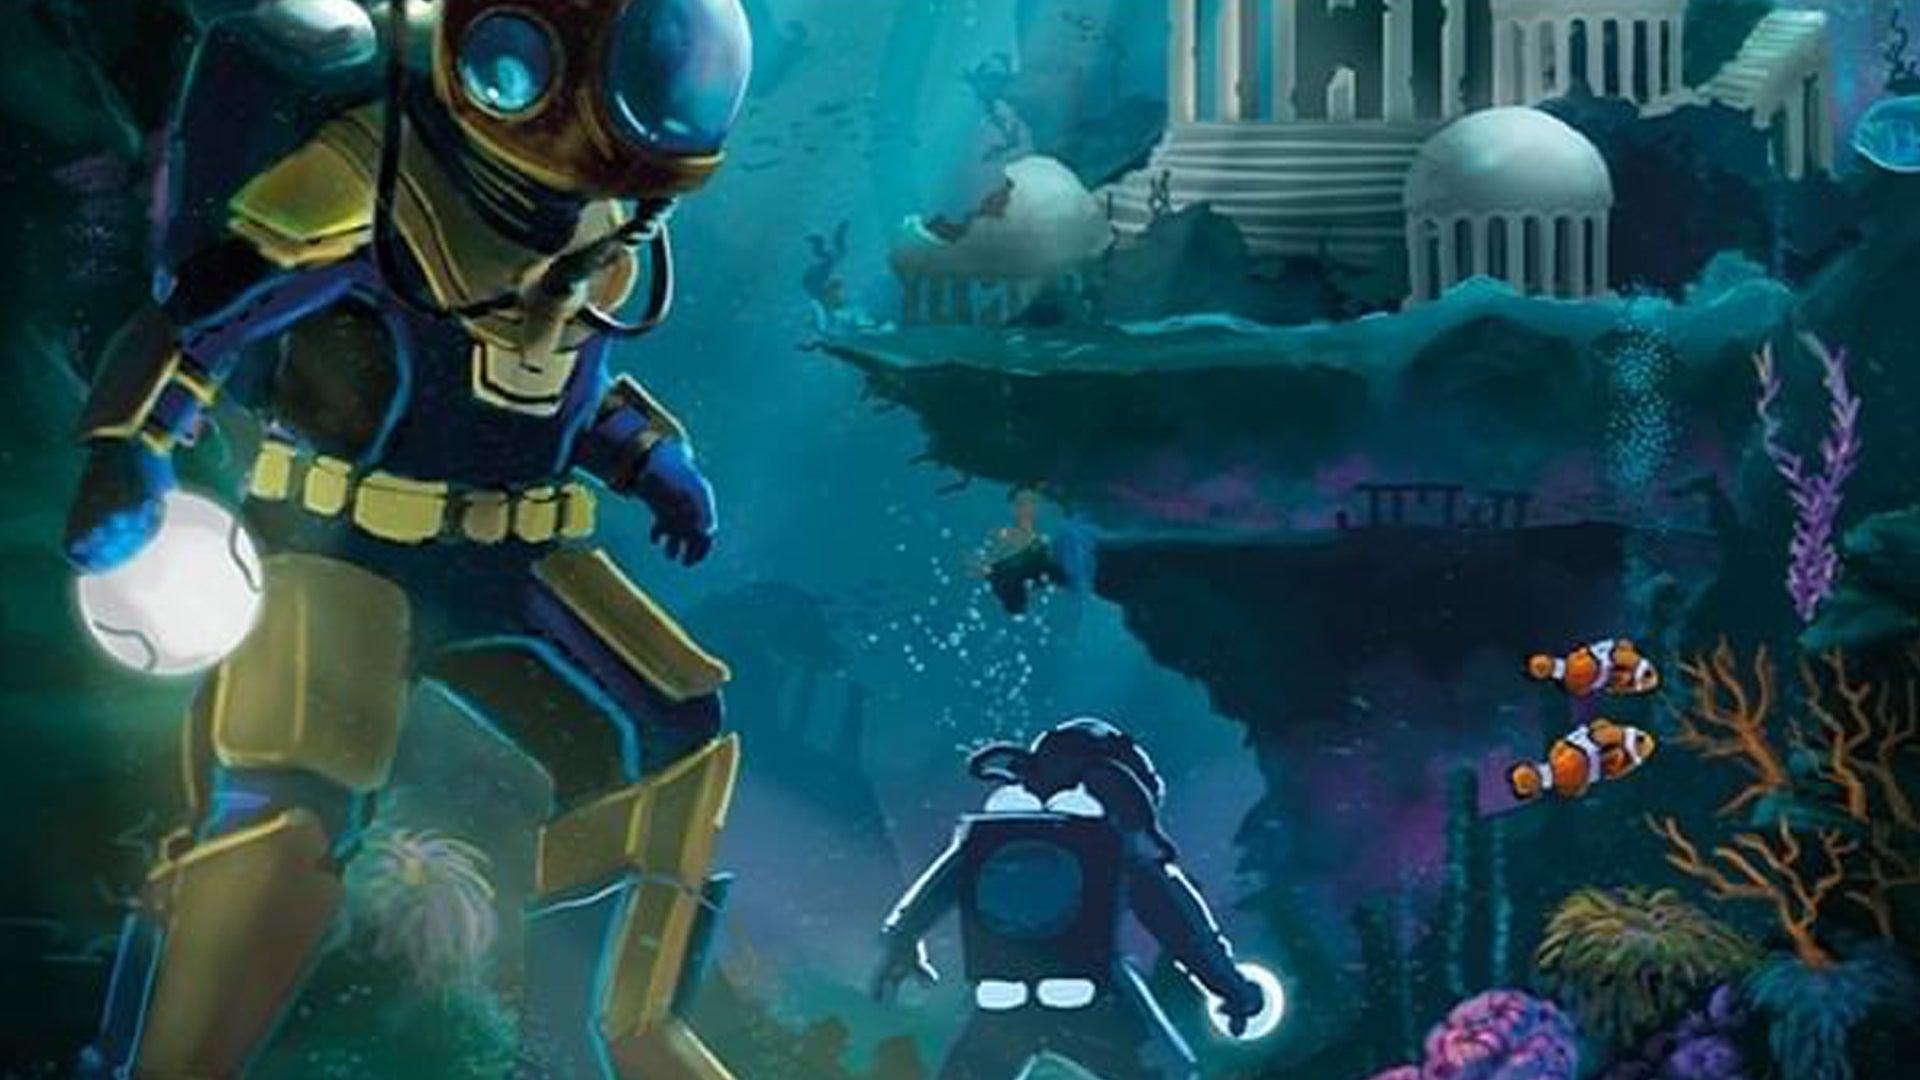 the-crew-mission-deep-sea-artwork-low.jpg